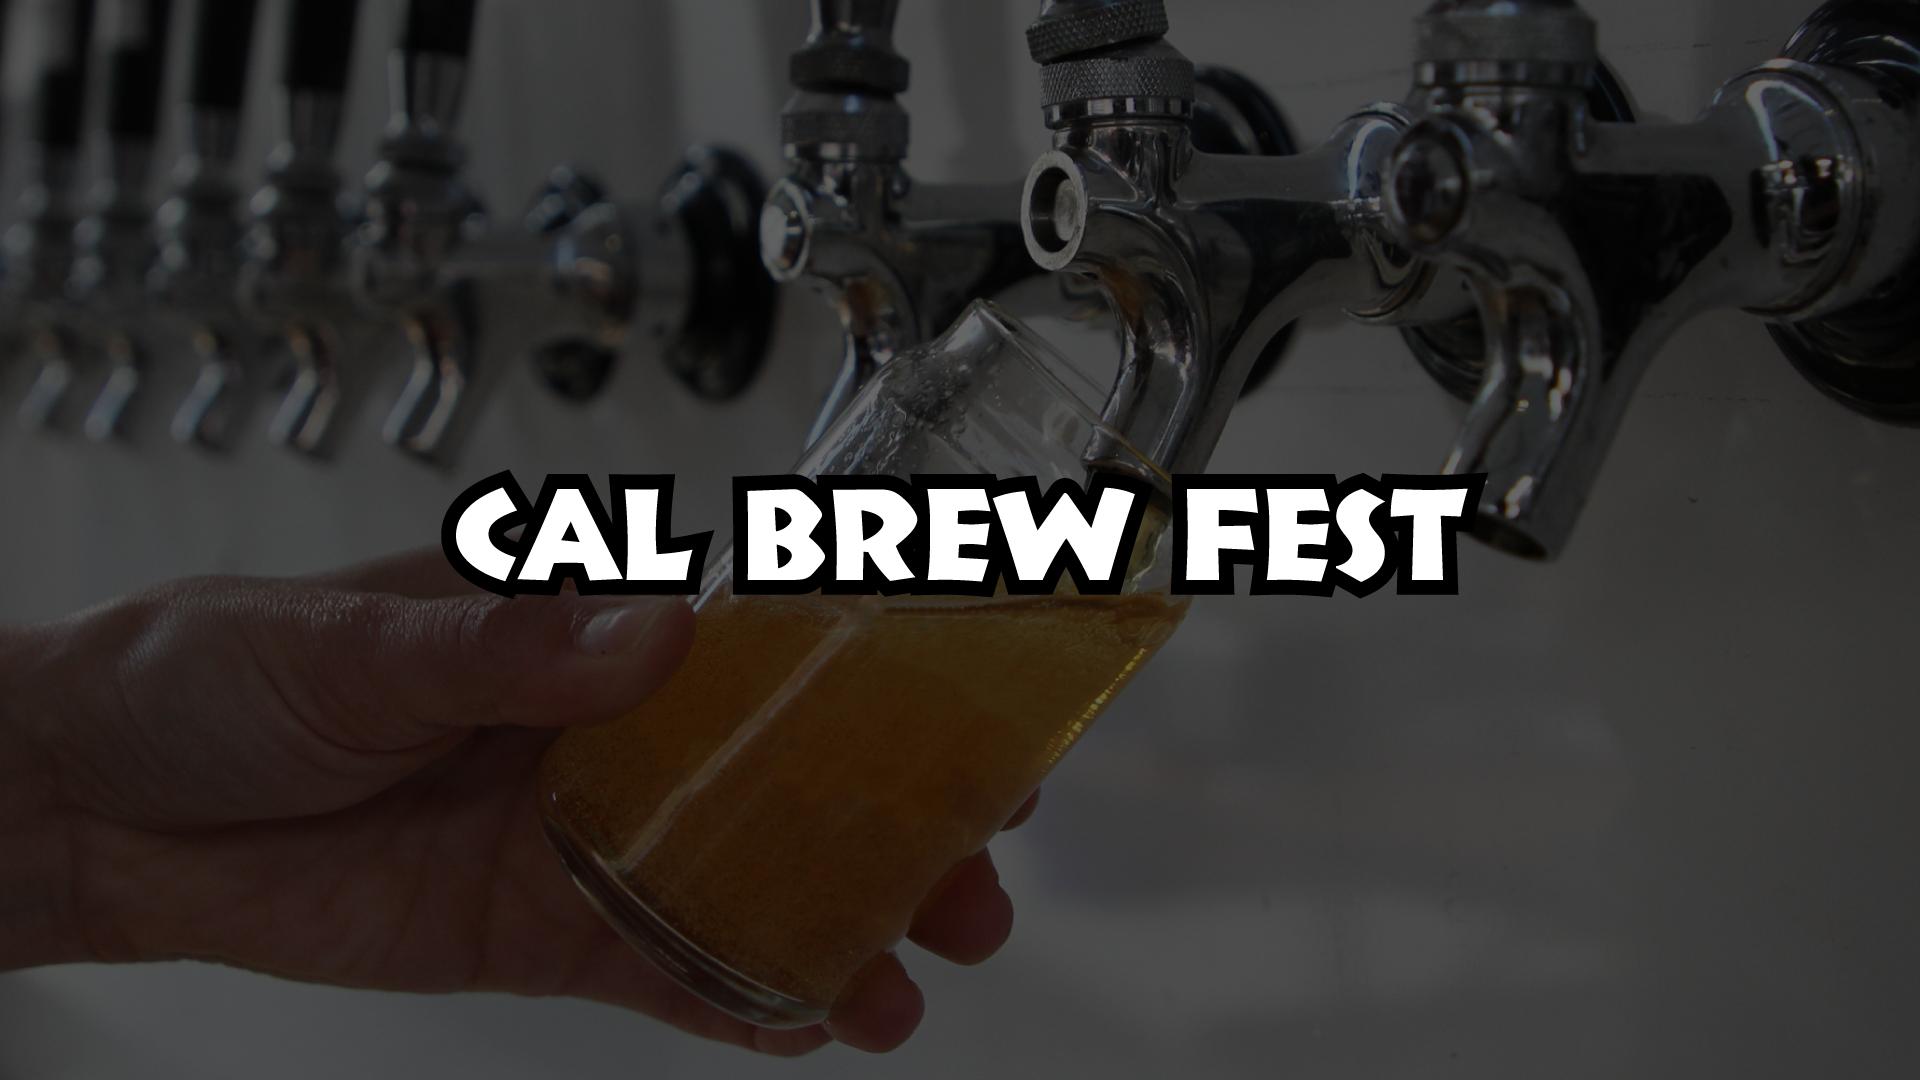 Cal Brew Fest